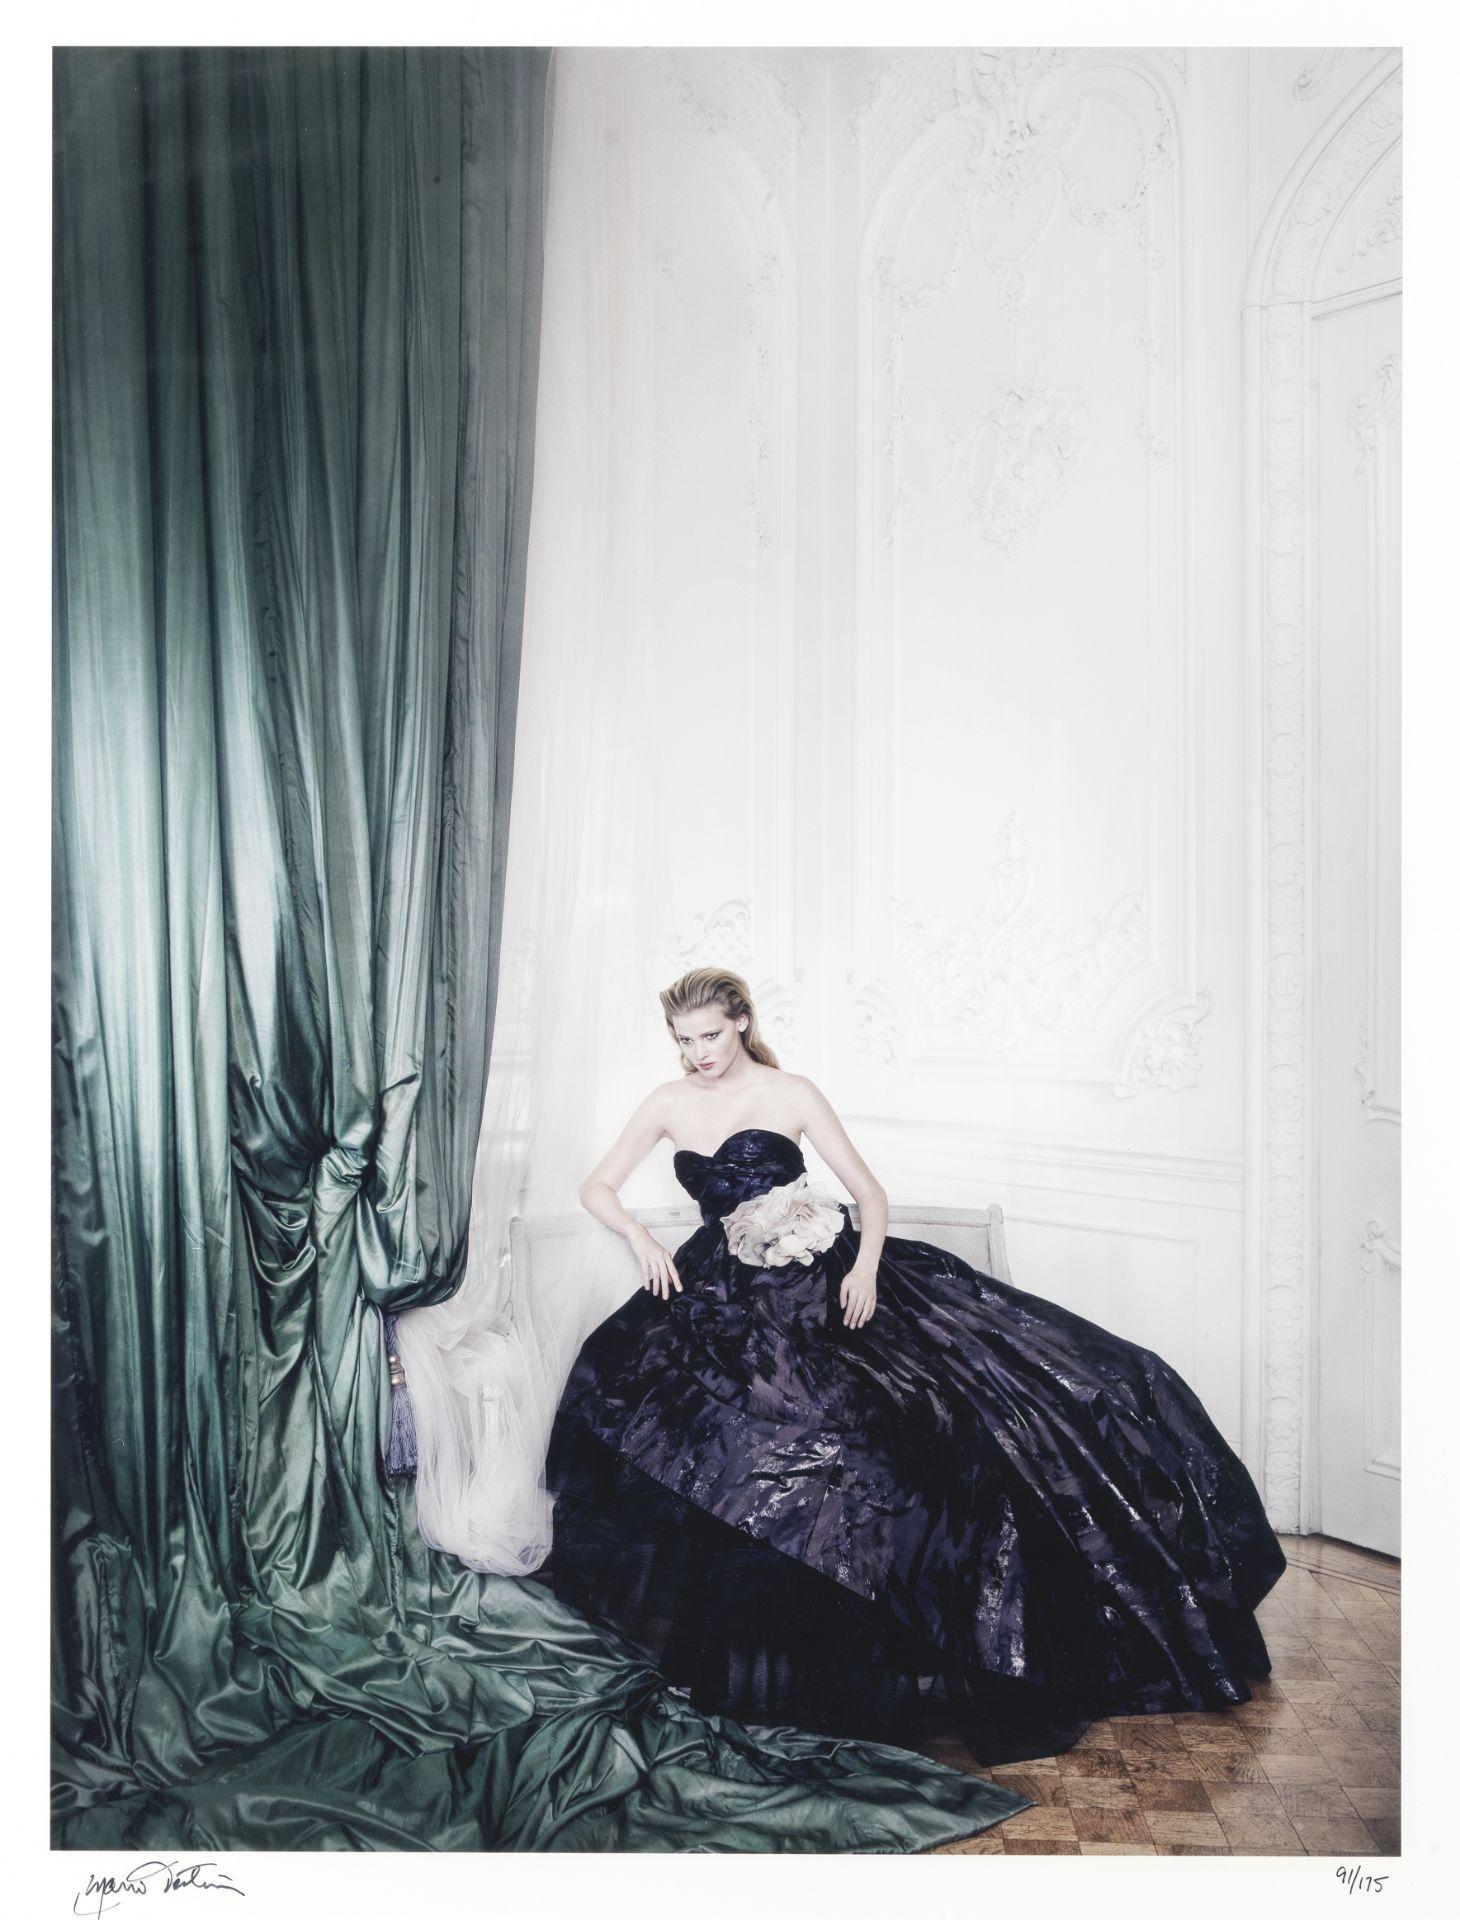 Mario Testino (Peruvian, b.1954): Lara Stone, London, British Vogue, 2008, printed 2010,